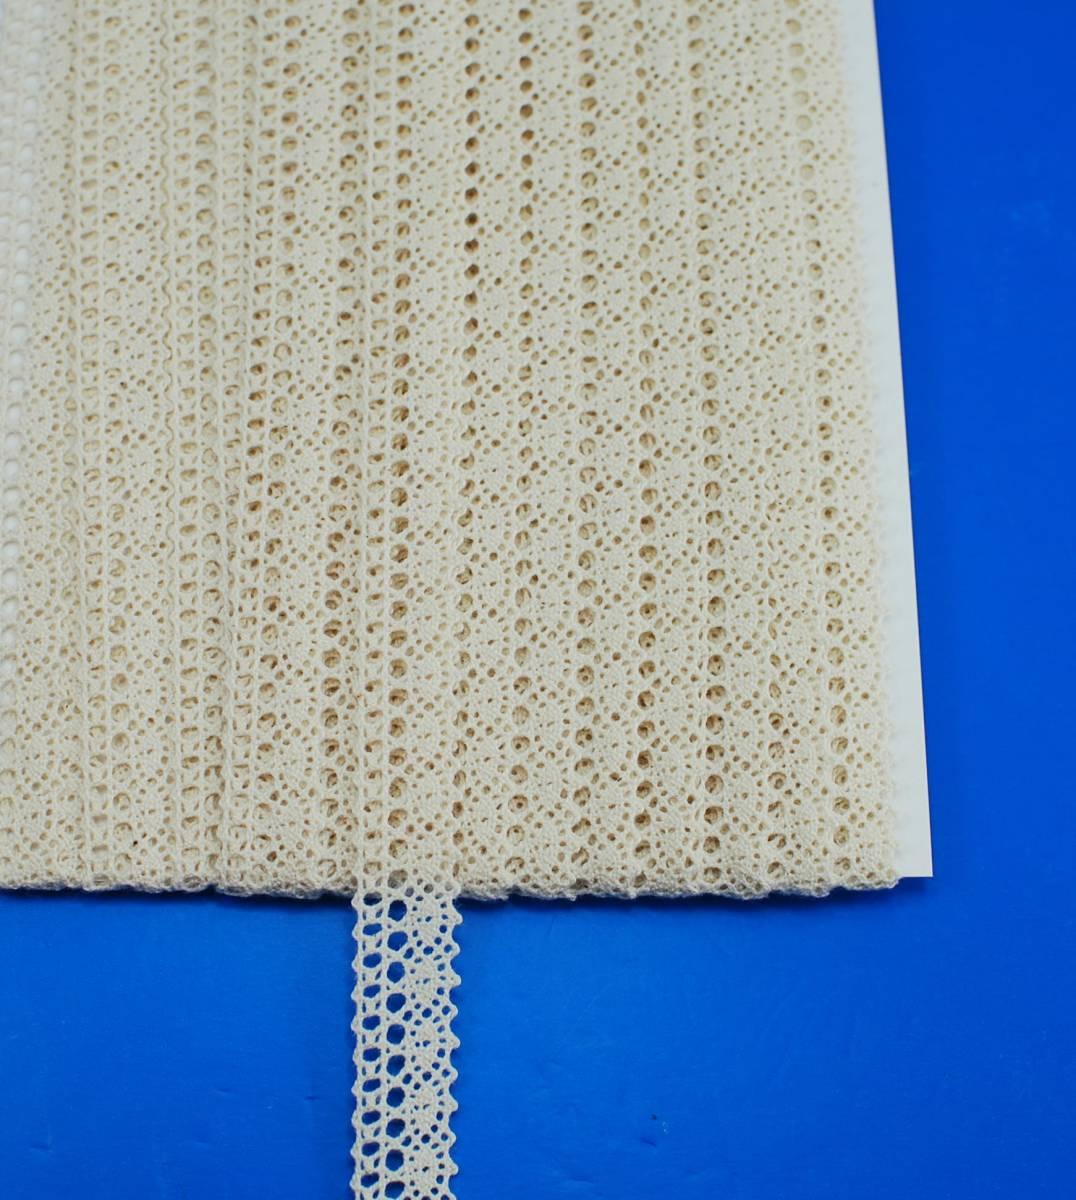 綿レース 15mm巾 生成 15m巻き_1反:15m巻きになります